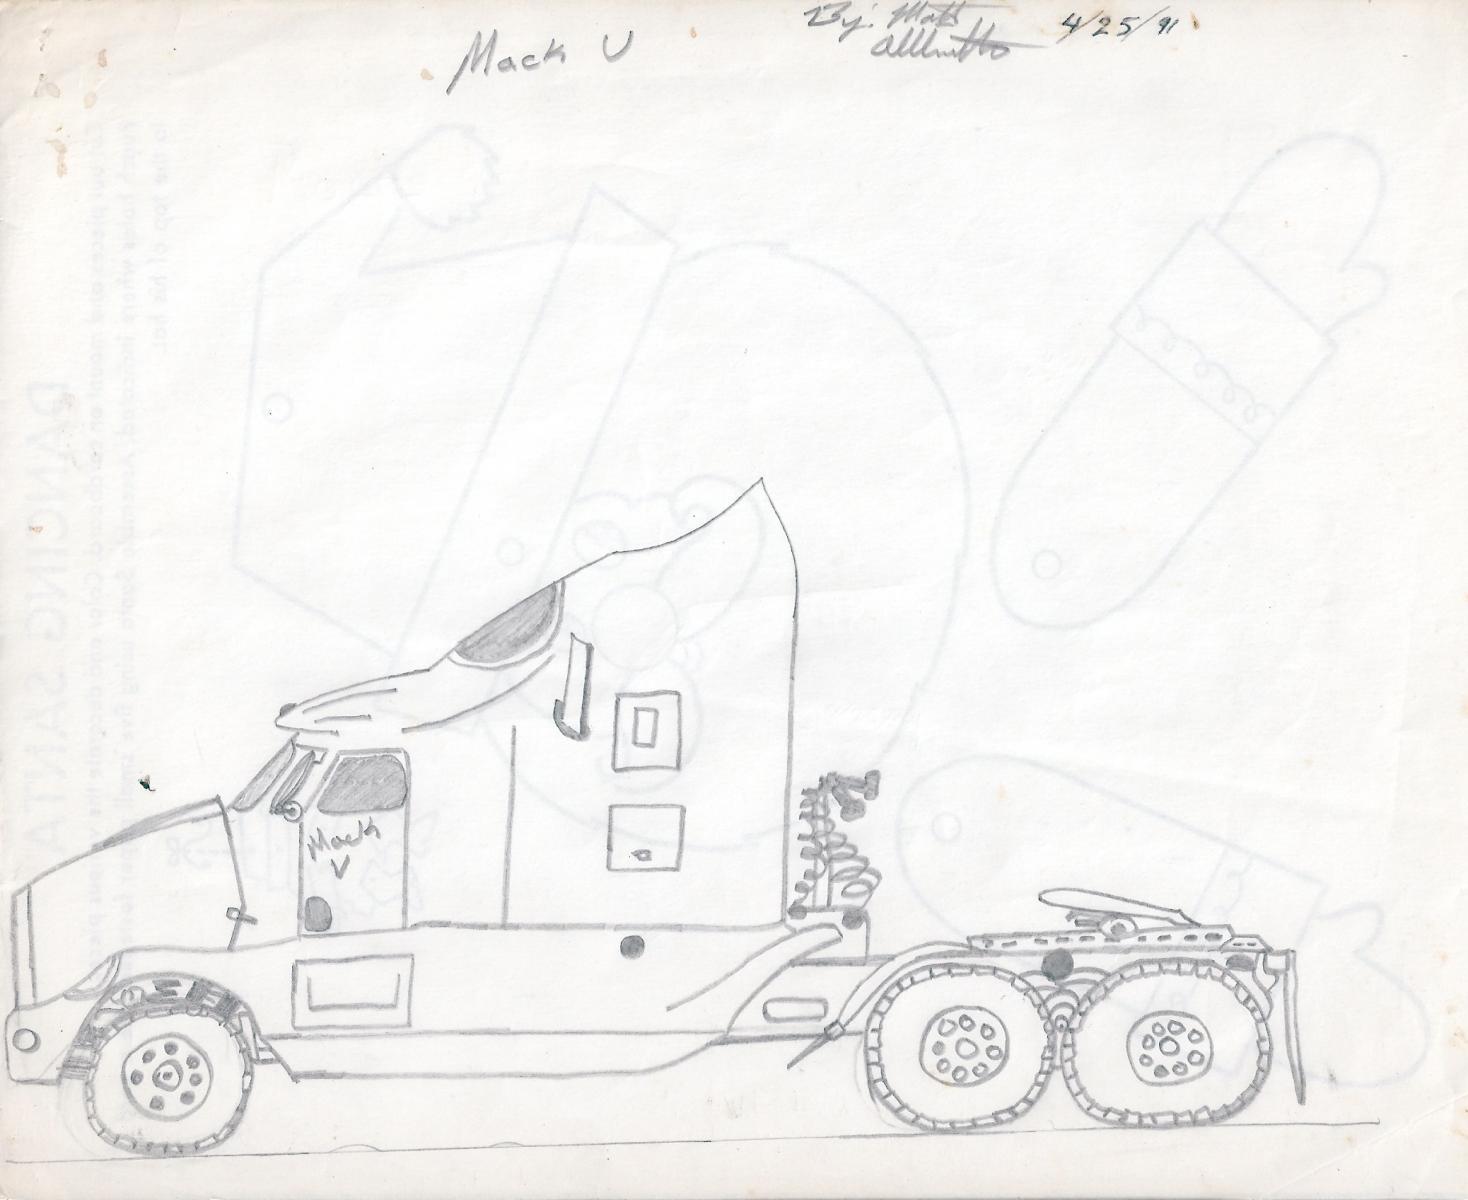 Mack V Concept Truck